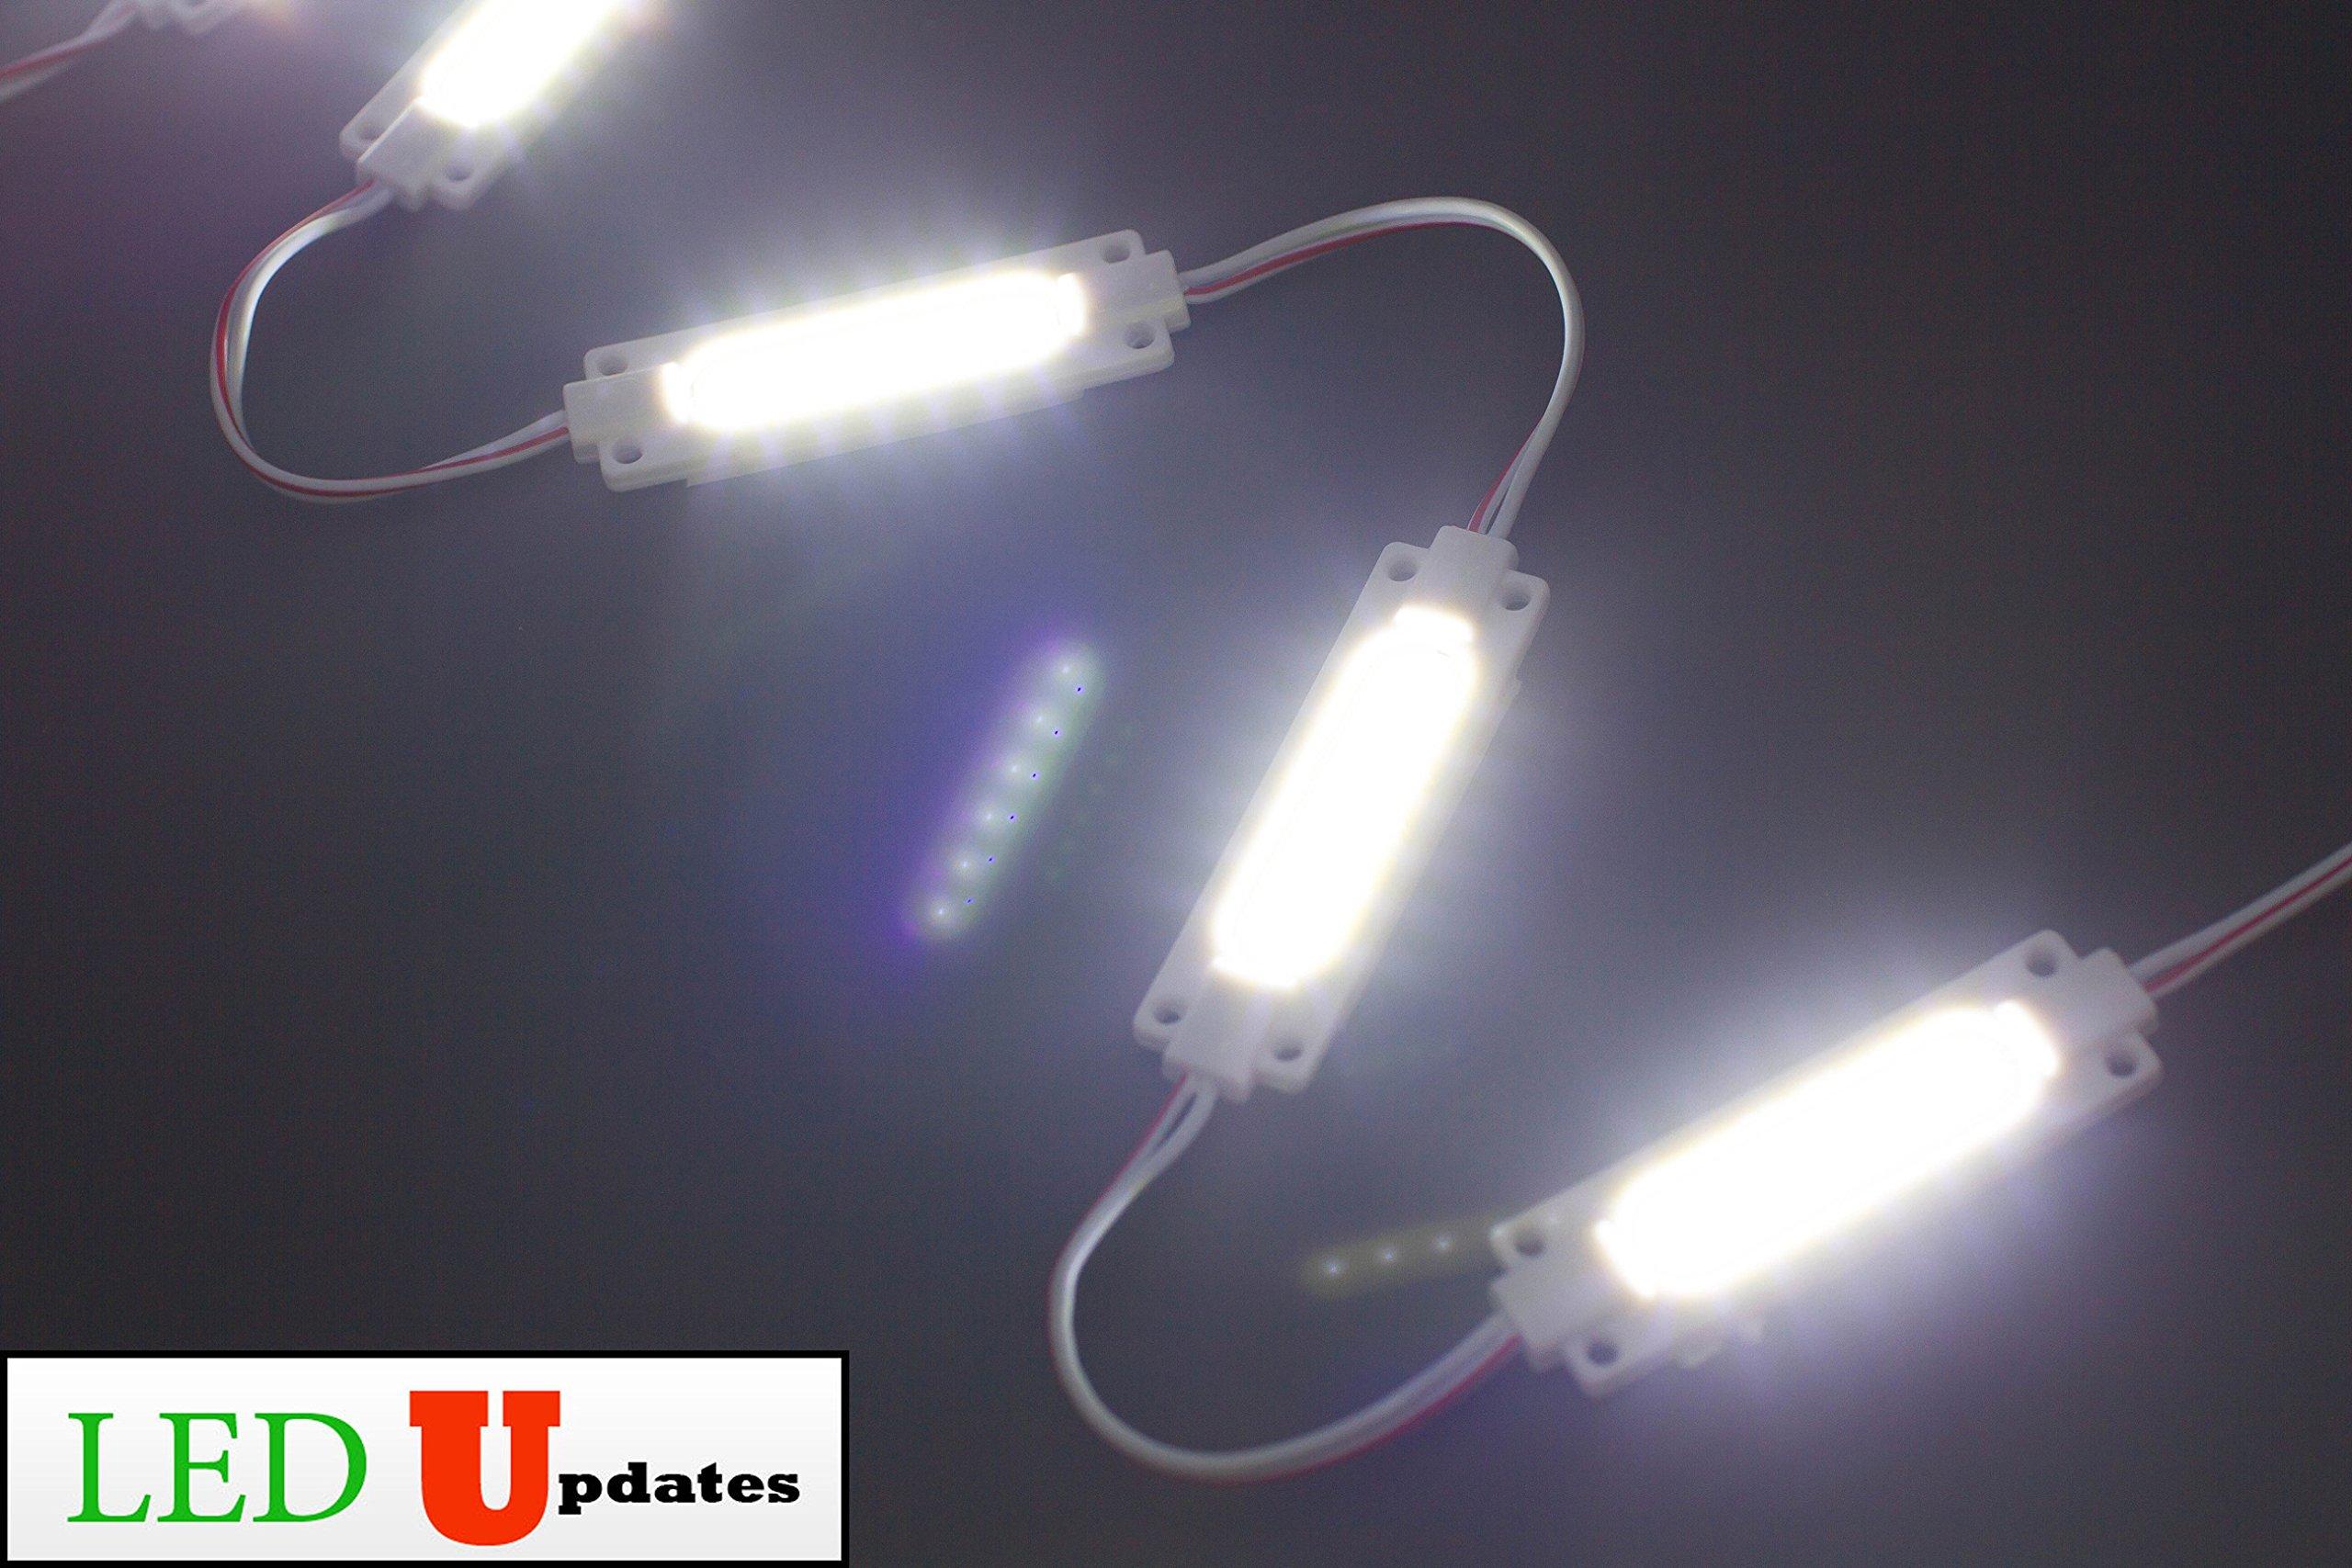 LEDUPDATES BRIGHTEST STOREFRONT WINDOW LED LIGHT COB WITH UL POWER SUPPLY BRIGHTER THAN 5050 5630 5730 2835 (20ft, White) by LEDUPDATES (Image #4)